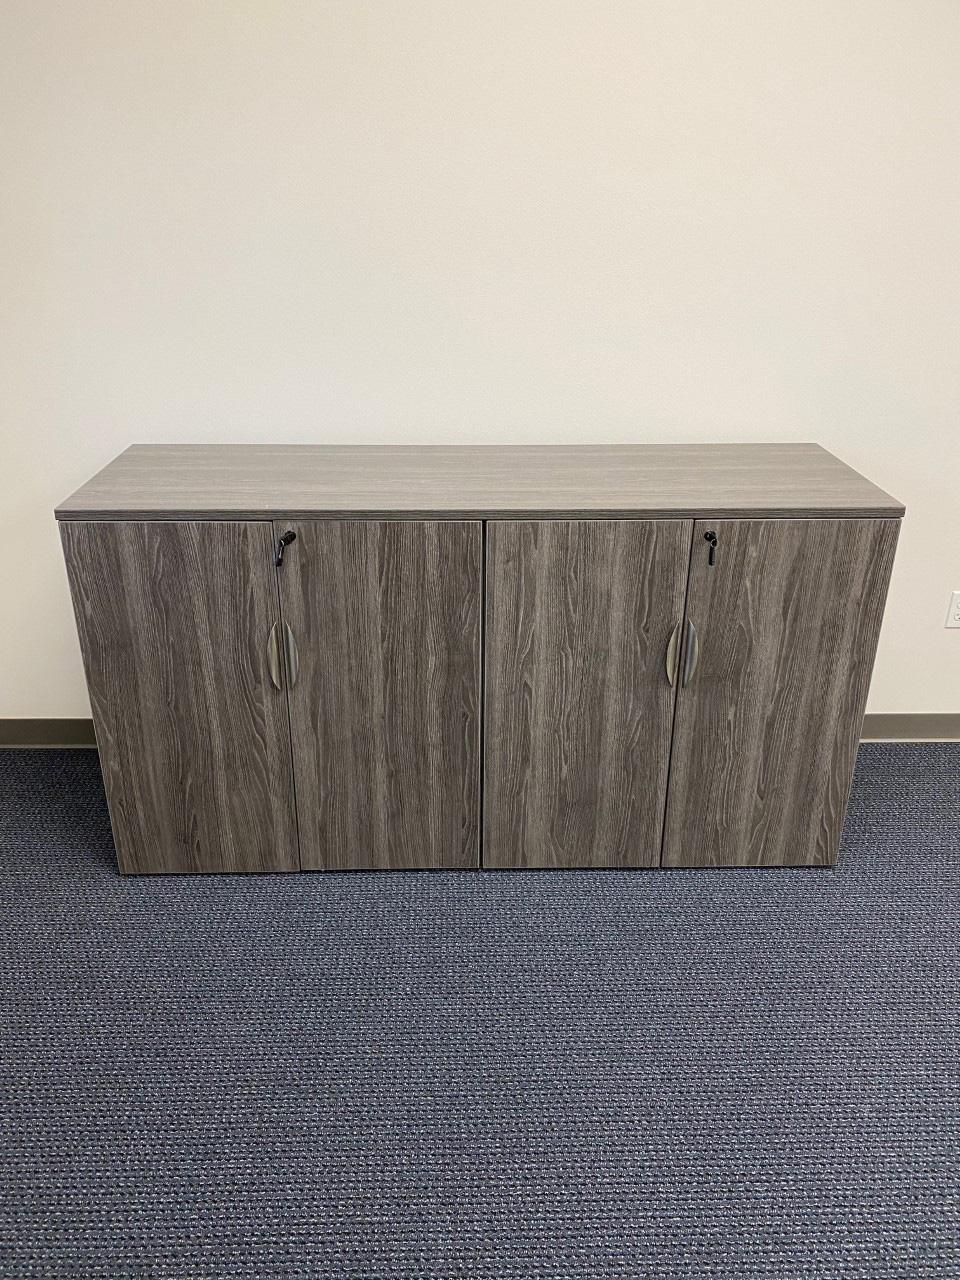 furniture-office-supplies-in-miami-florida-5-.jpg